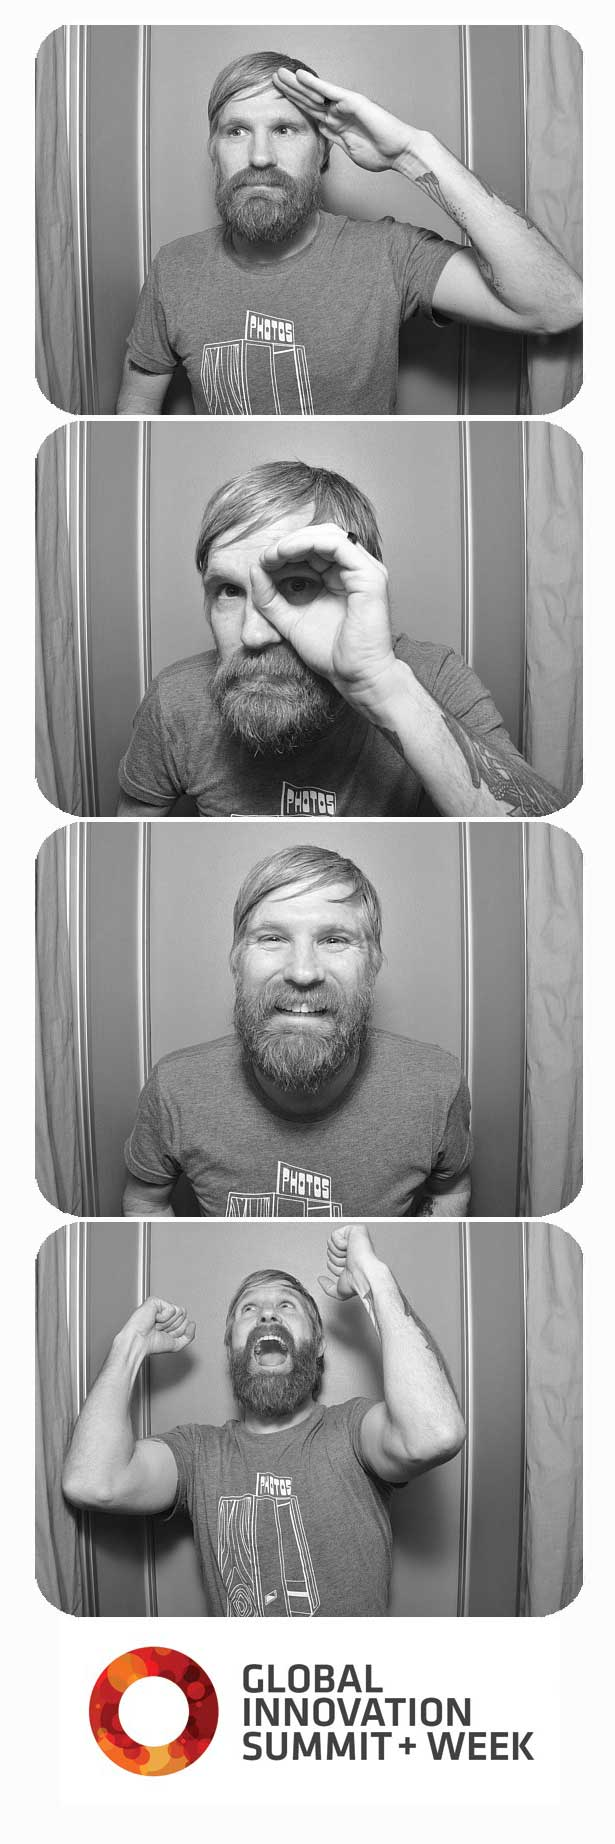 photo-booth-_210.jpg